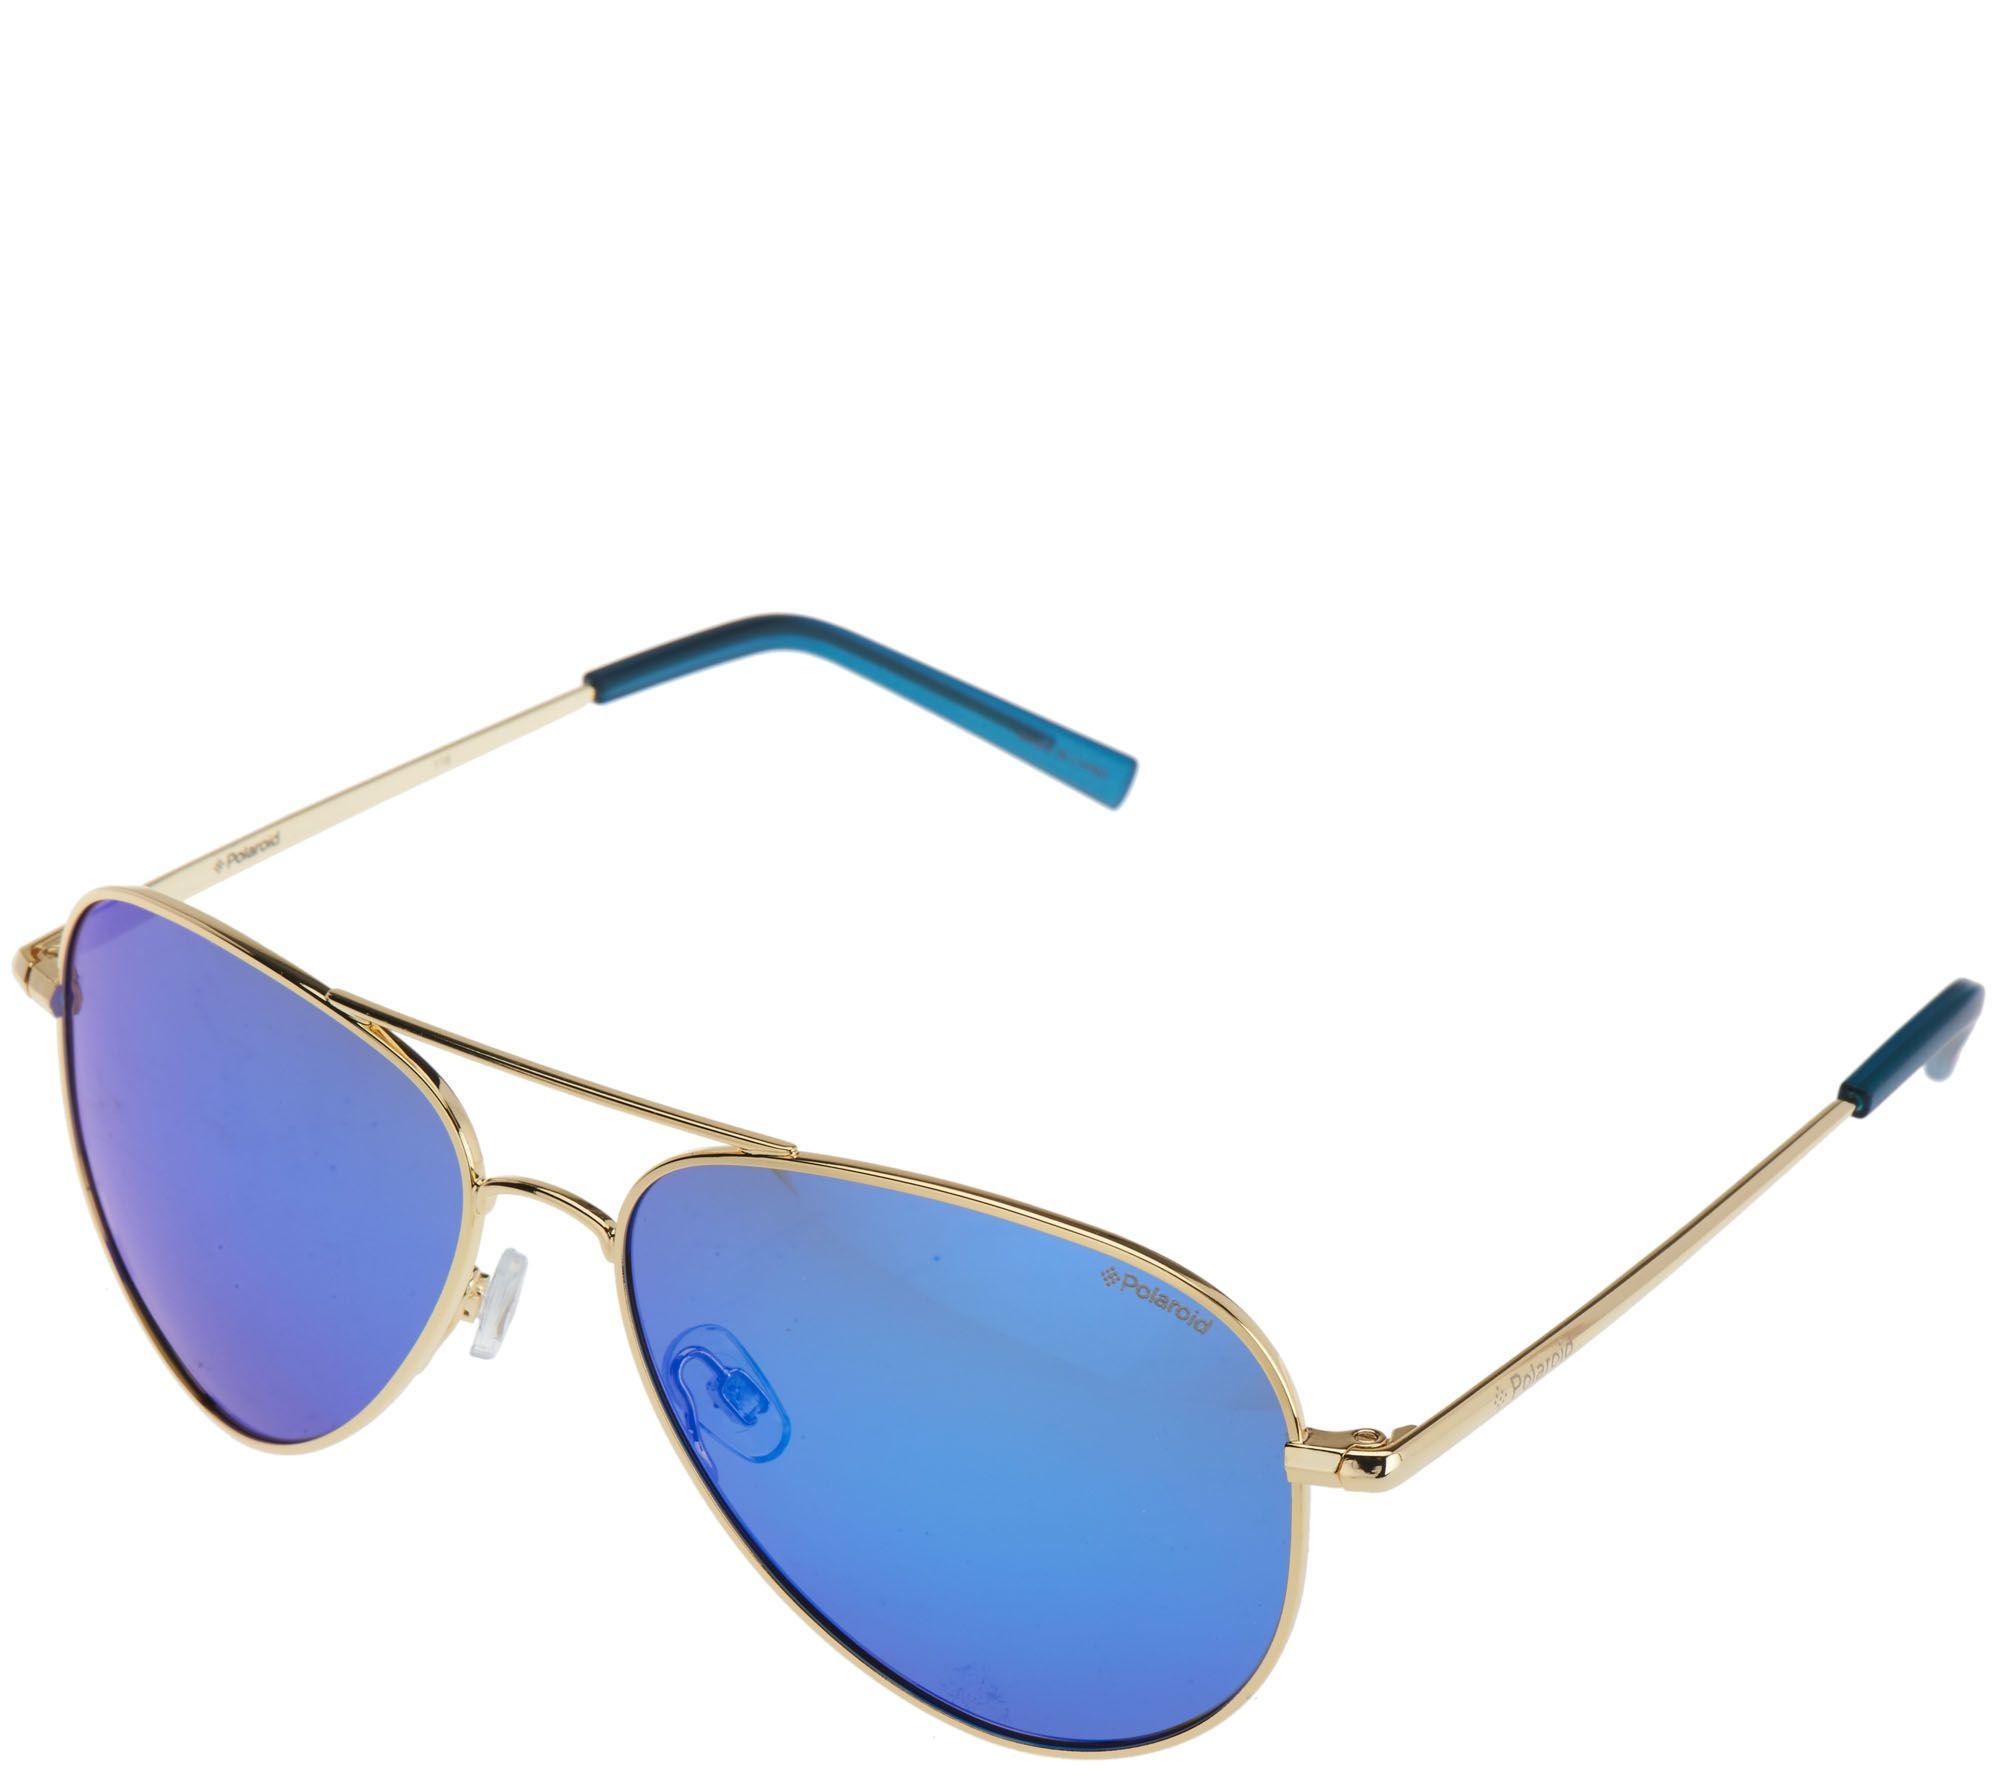 d2d11cd9c5 Polaroid Aviator Polarized Sunglasses with Case   Kit - Page 1 — QVC.com